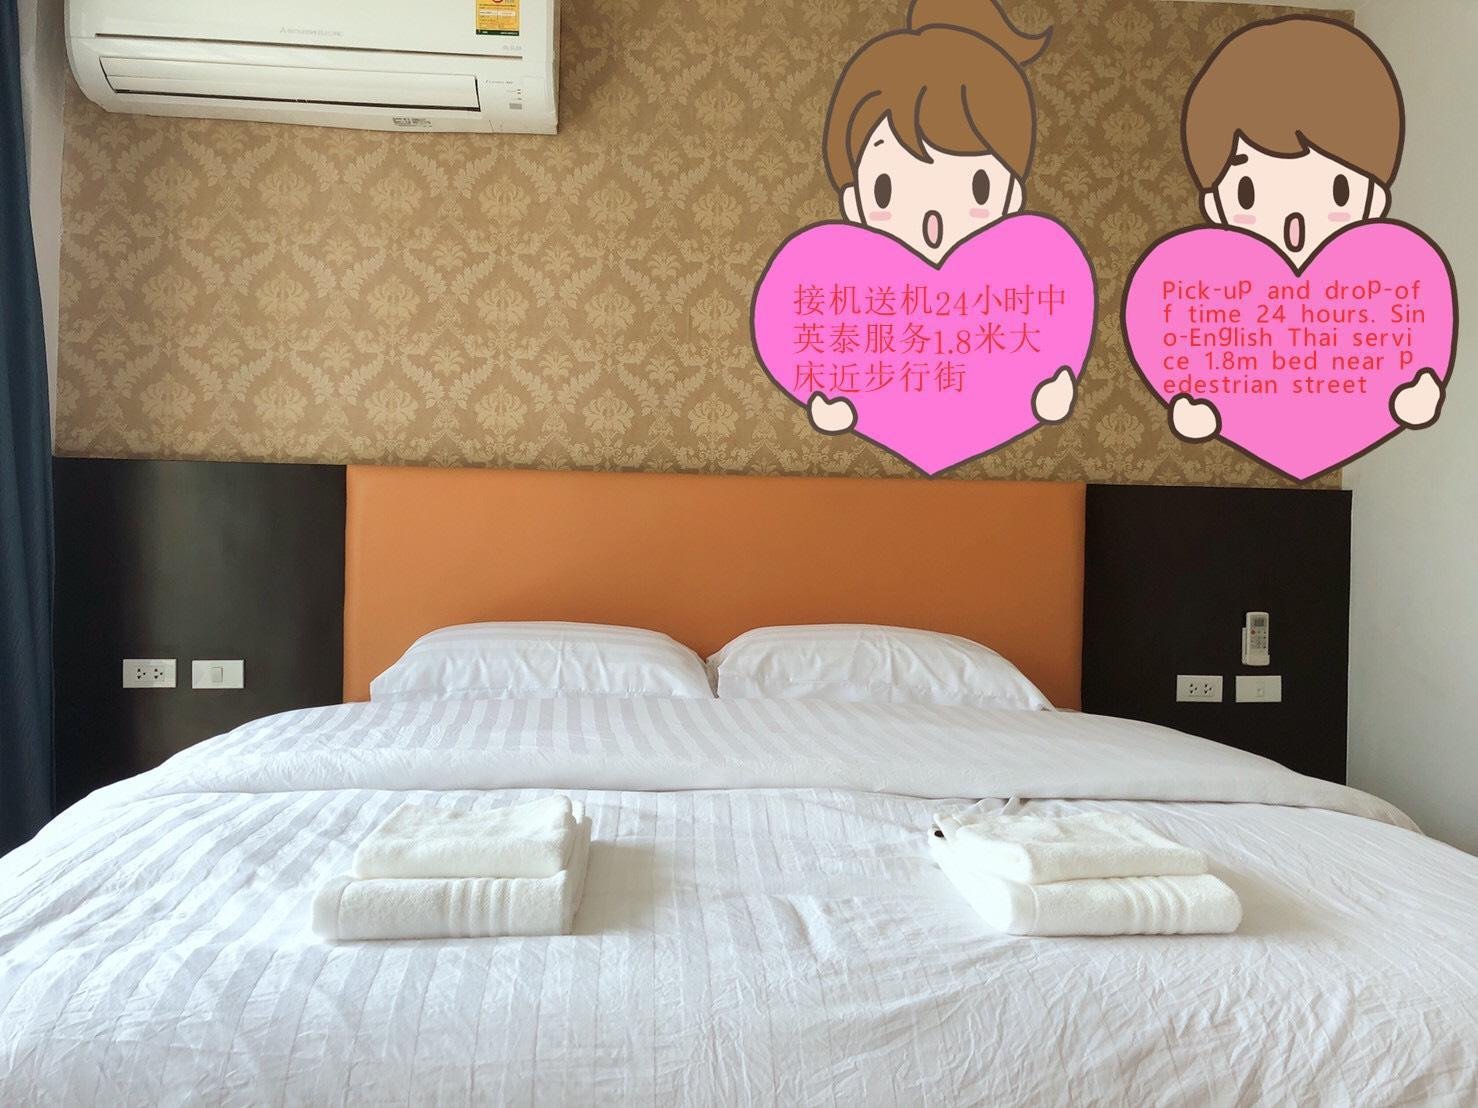 [HW] 1.8m large bed room 36m2 large room 5 อพาร์ตเมนต์ 1 ห้องนอน 1 ห้องน้ำส่วนตัว ขนาด 36 ตร.ม. – พัทยากลาง